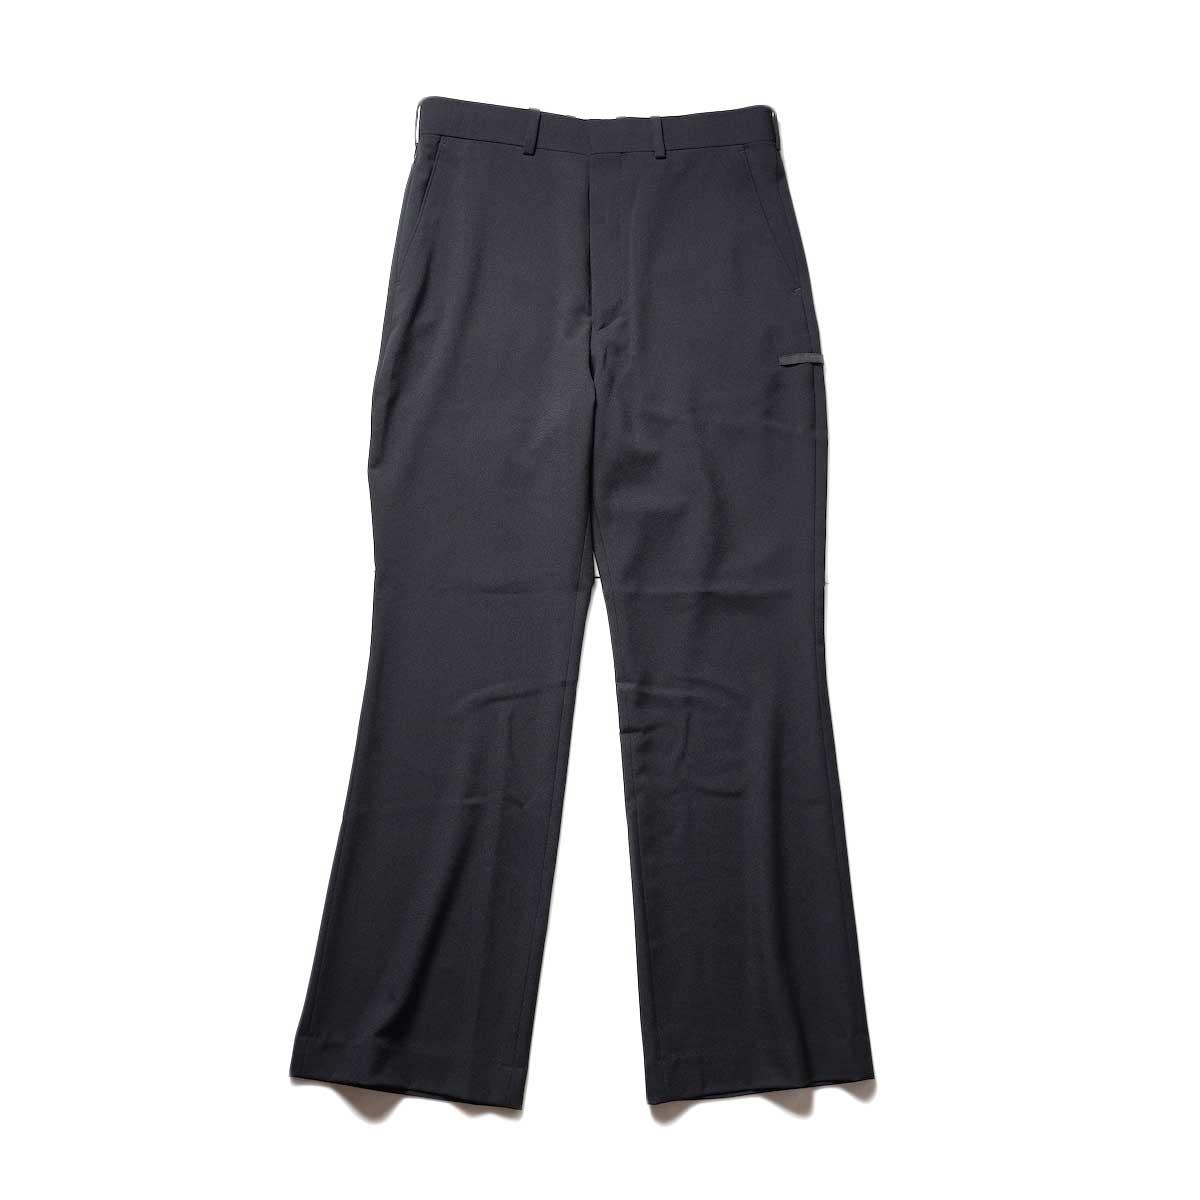 N.HOOLYWOOD / 2212-PT21-008 Flair Pants (Black)